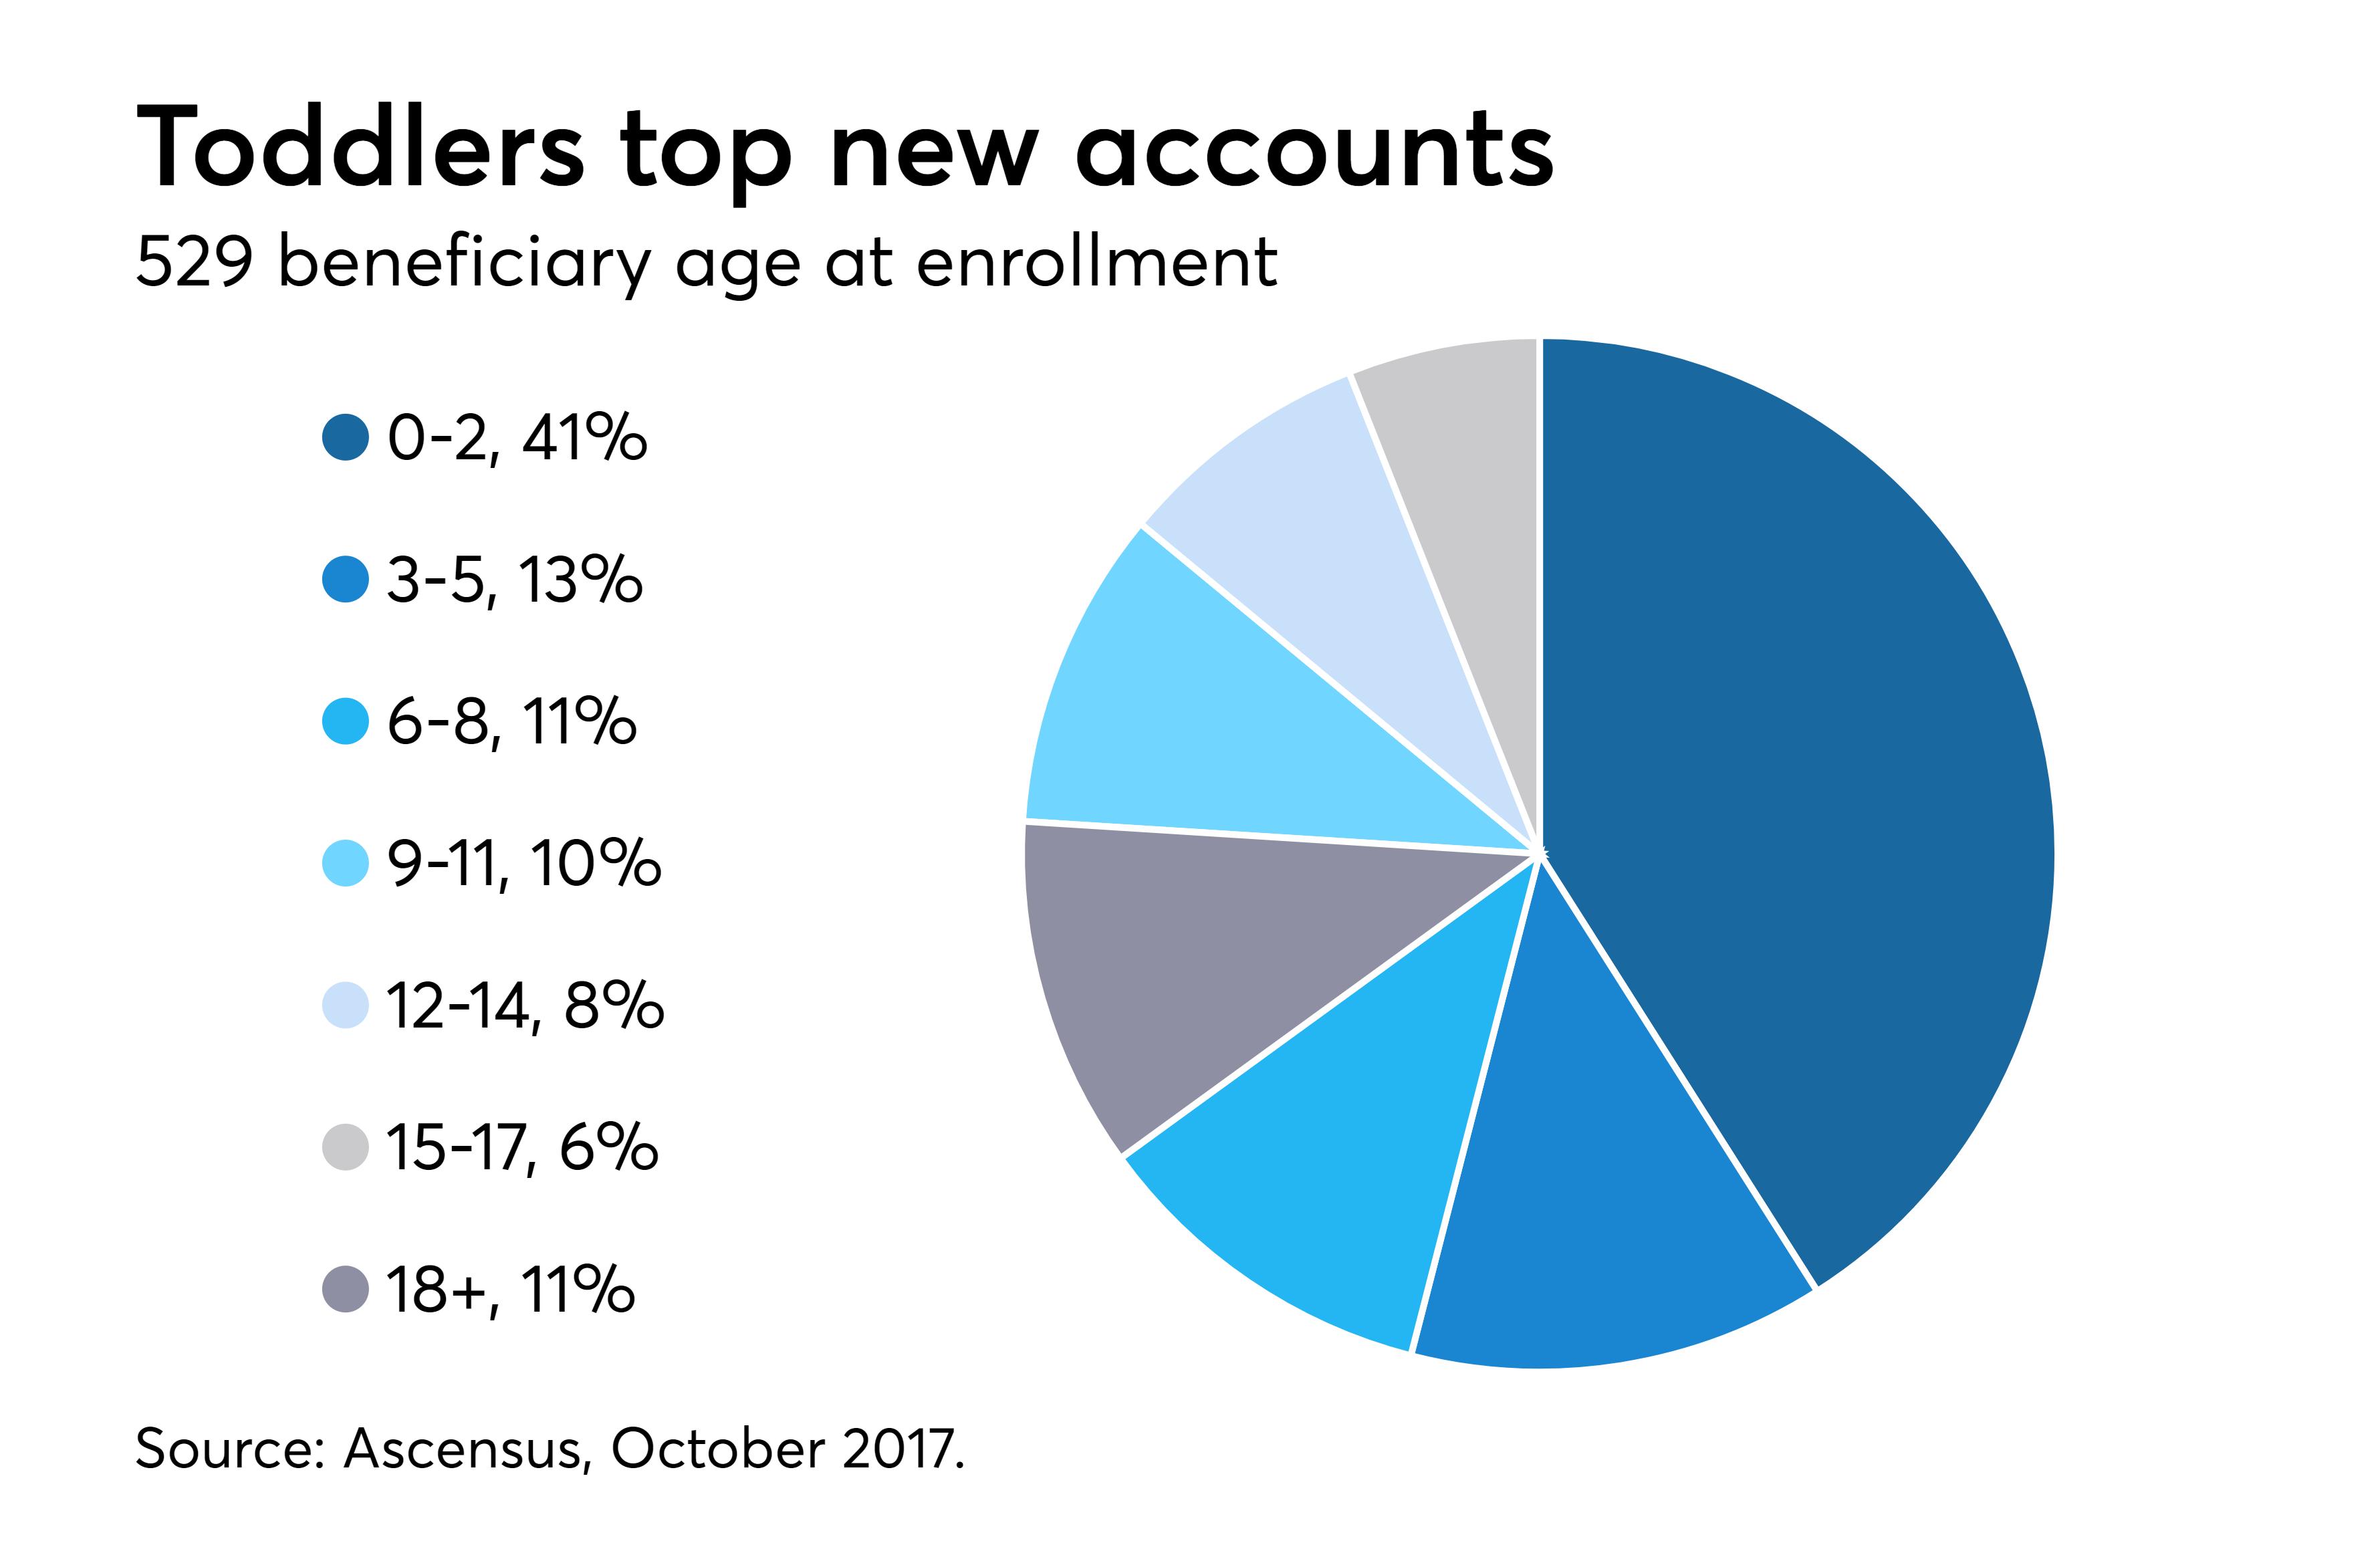 https://assets.sourcemedia.com/fb/e8/429e61aa493eaced622dacb1d8e0/529-age-at-enrollment.png